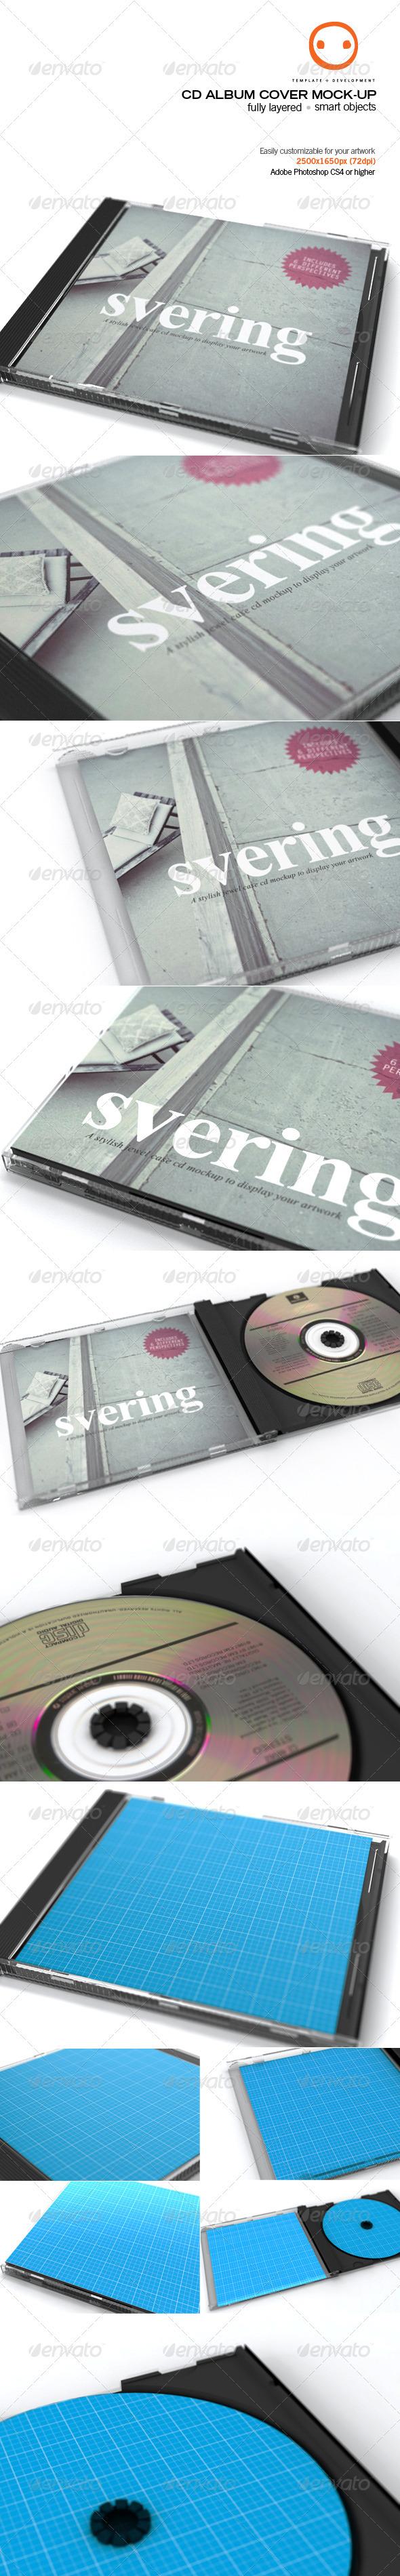 GraphicRiver CD Album Cover Mock-up 2533489